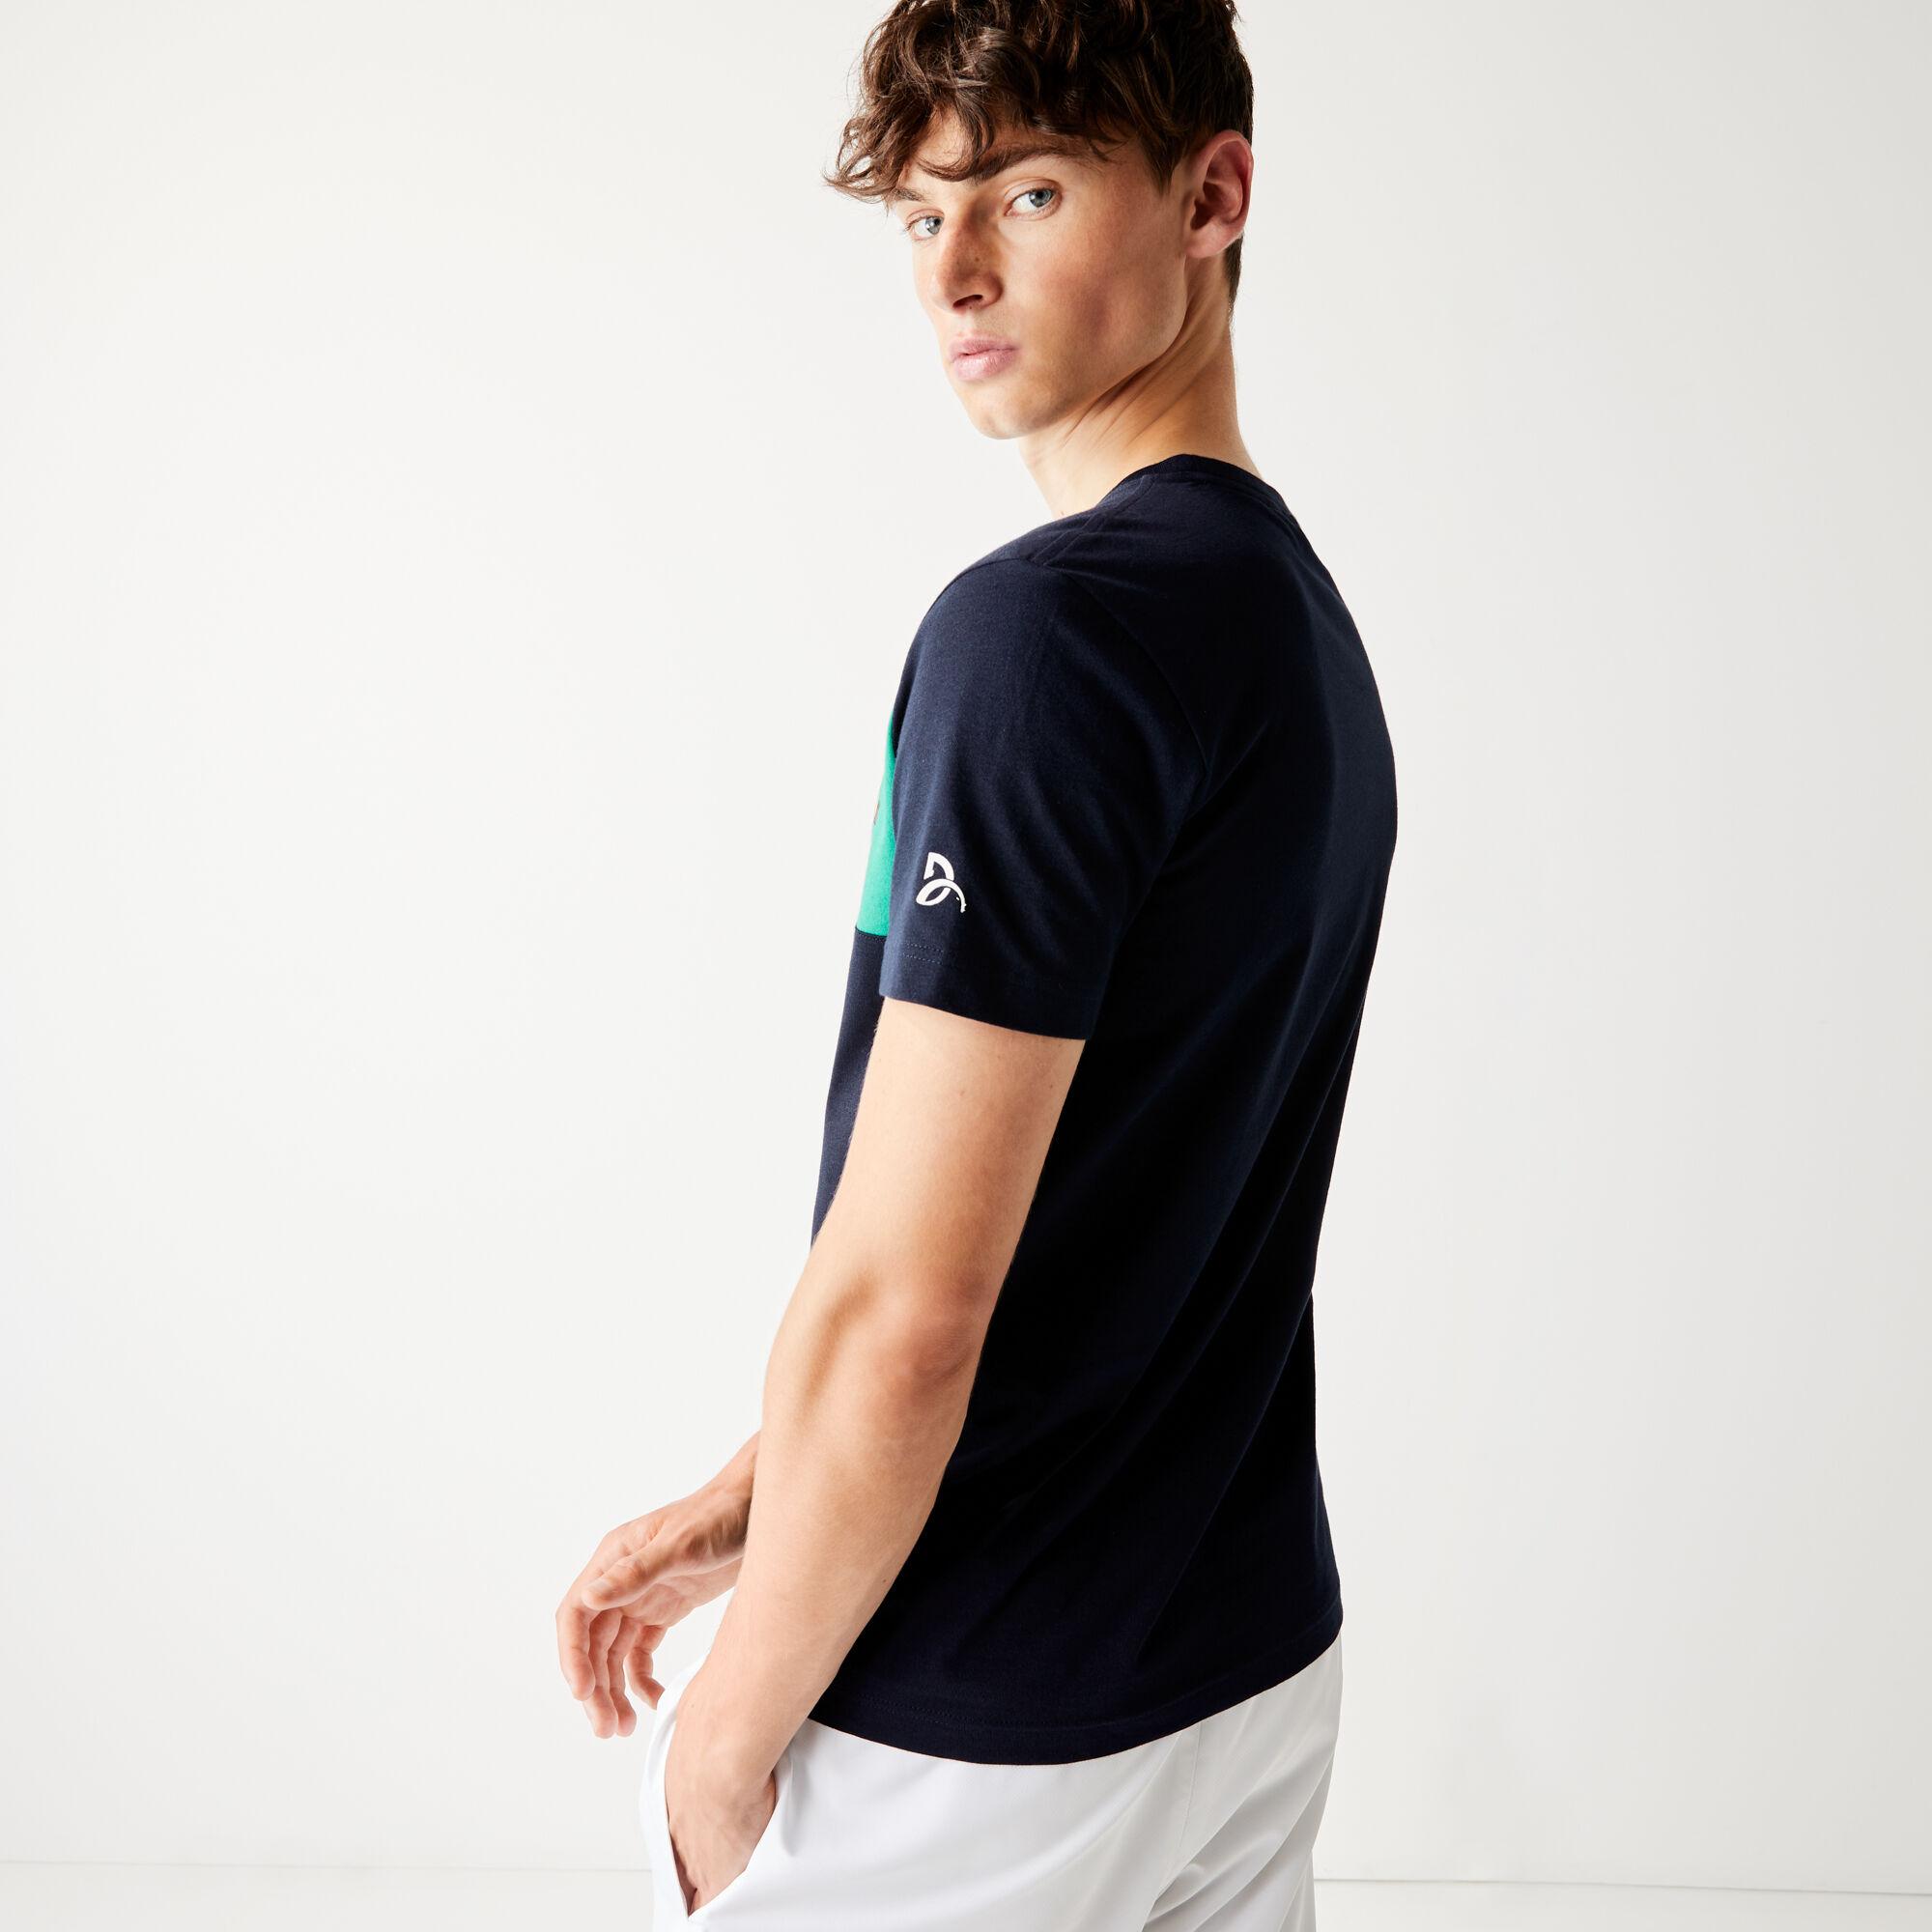 Men's Lacoste SPORT Collab Youssef SY Cotton T-shirt